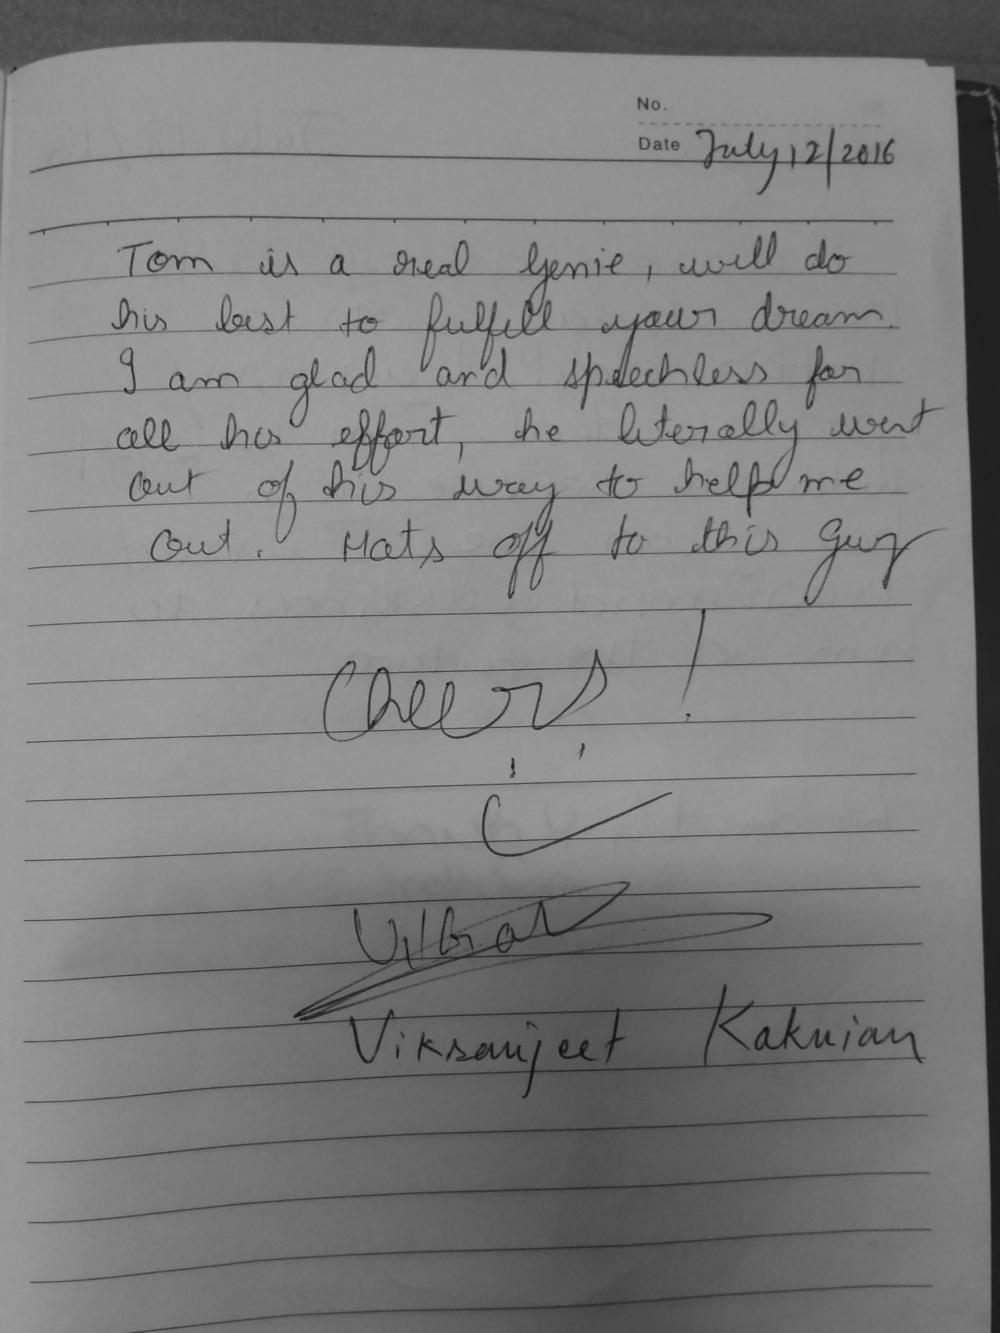 Vikramjeet Kaknian_Testimonial.jpg